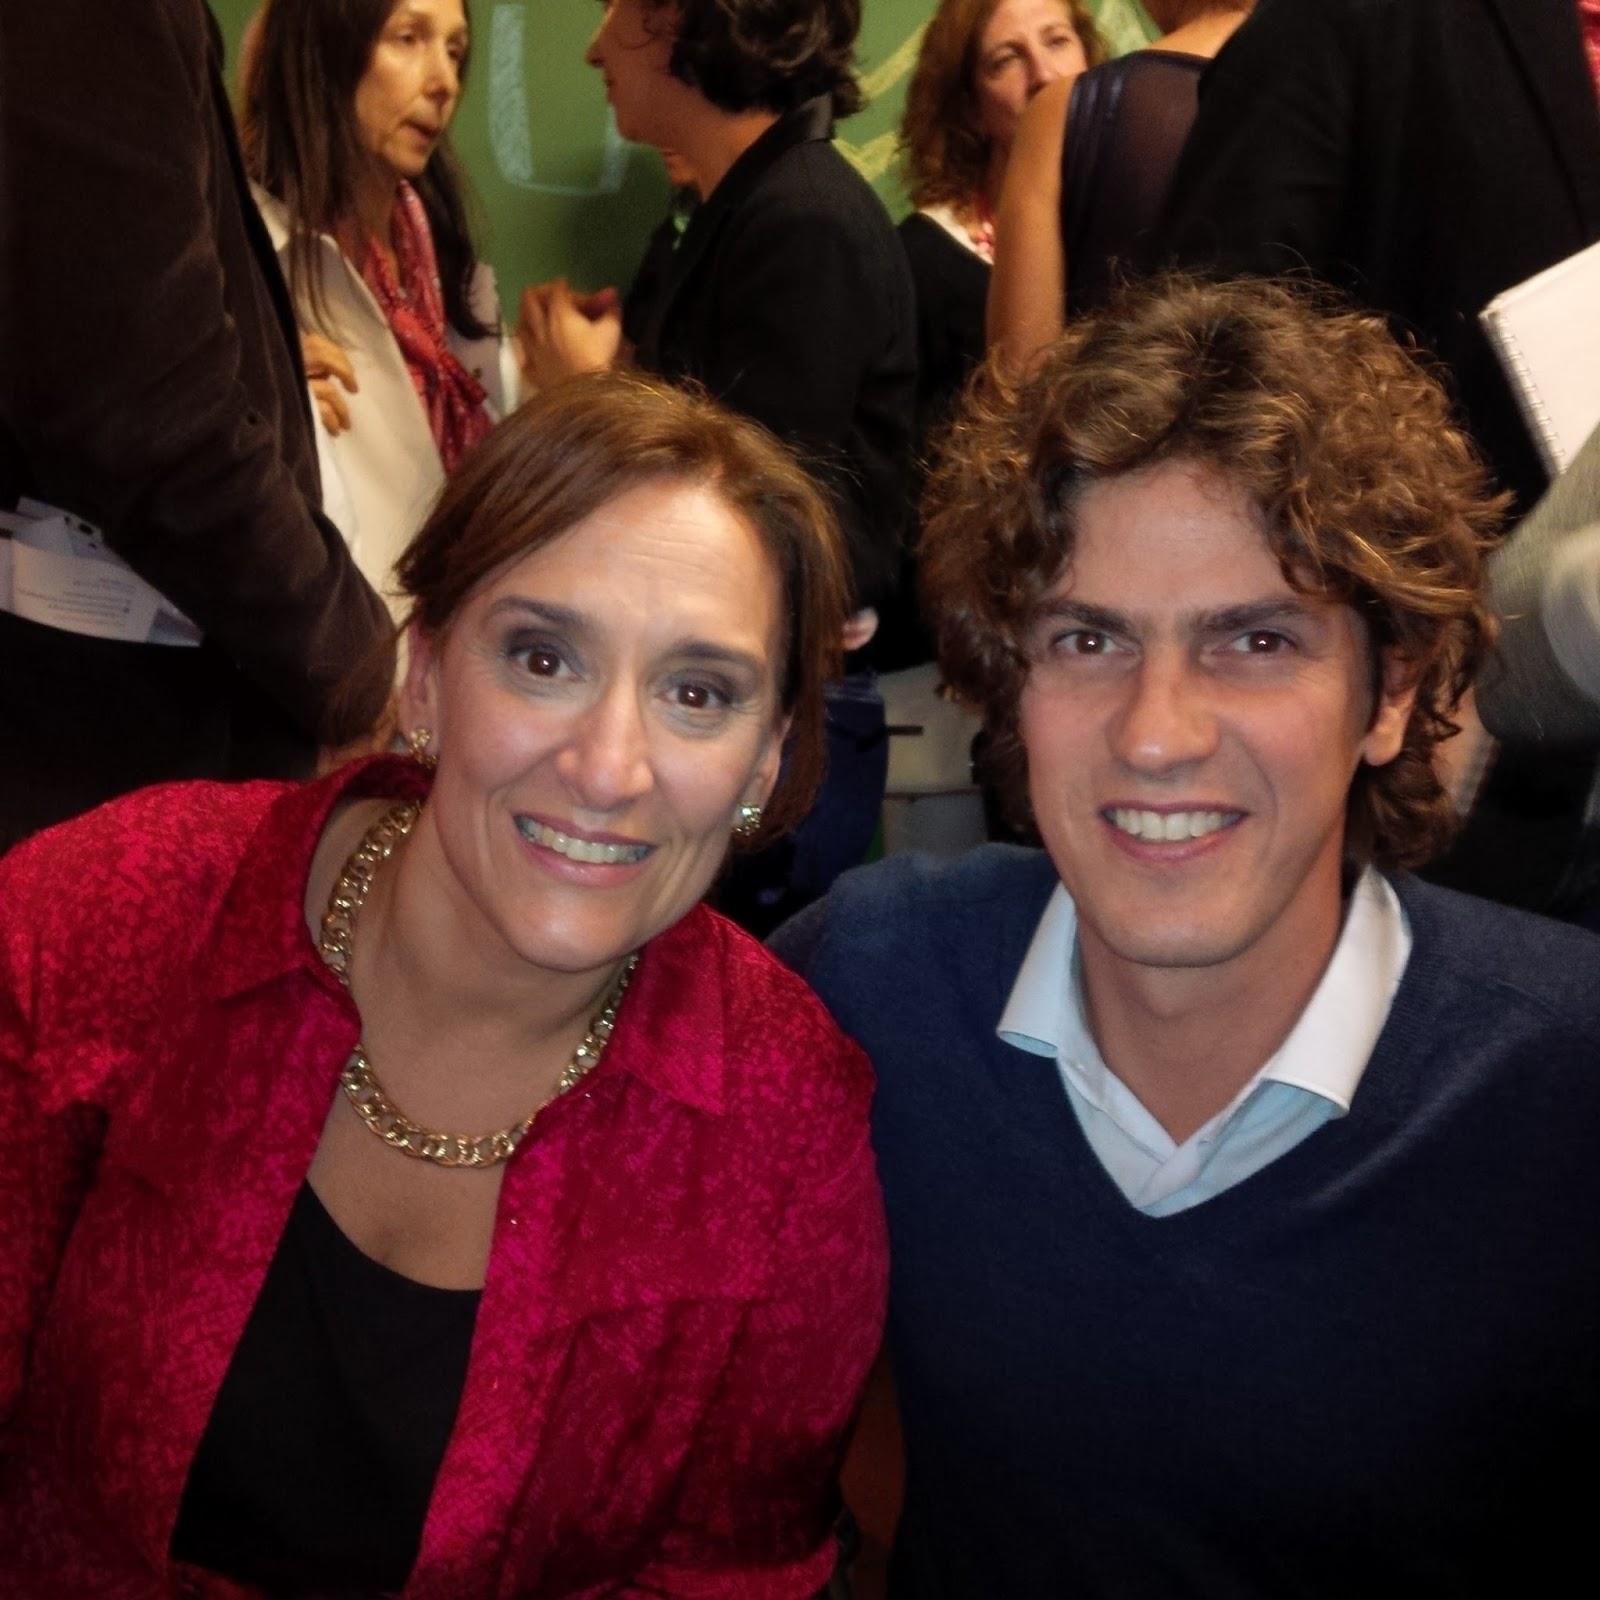 Gabriela Michetti y Martín Lousteau buscan competir por la jefatura porteña